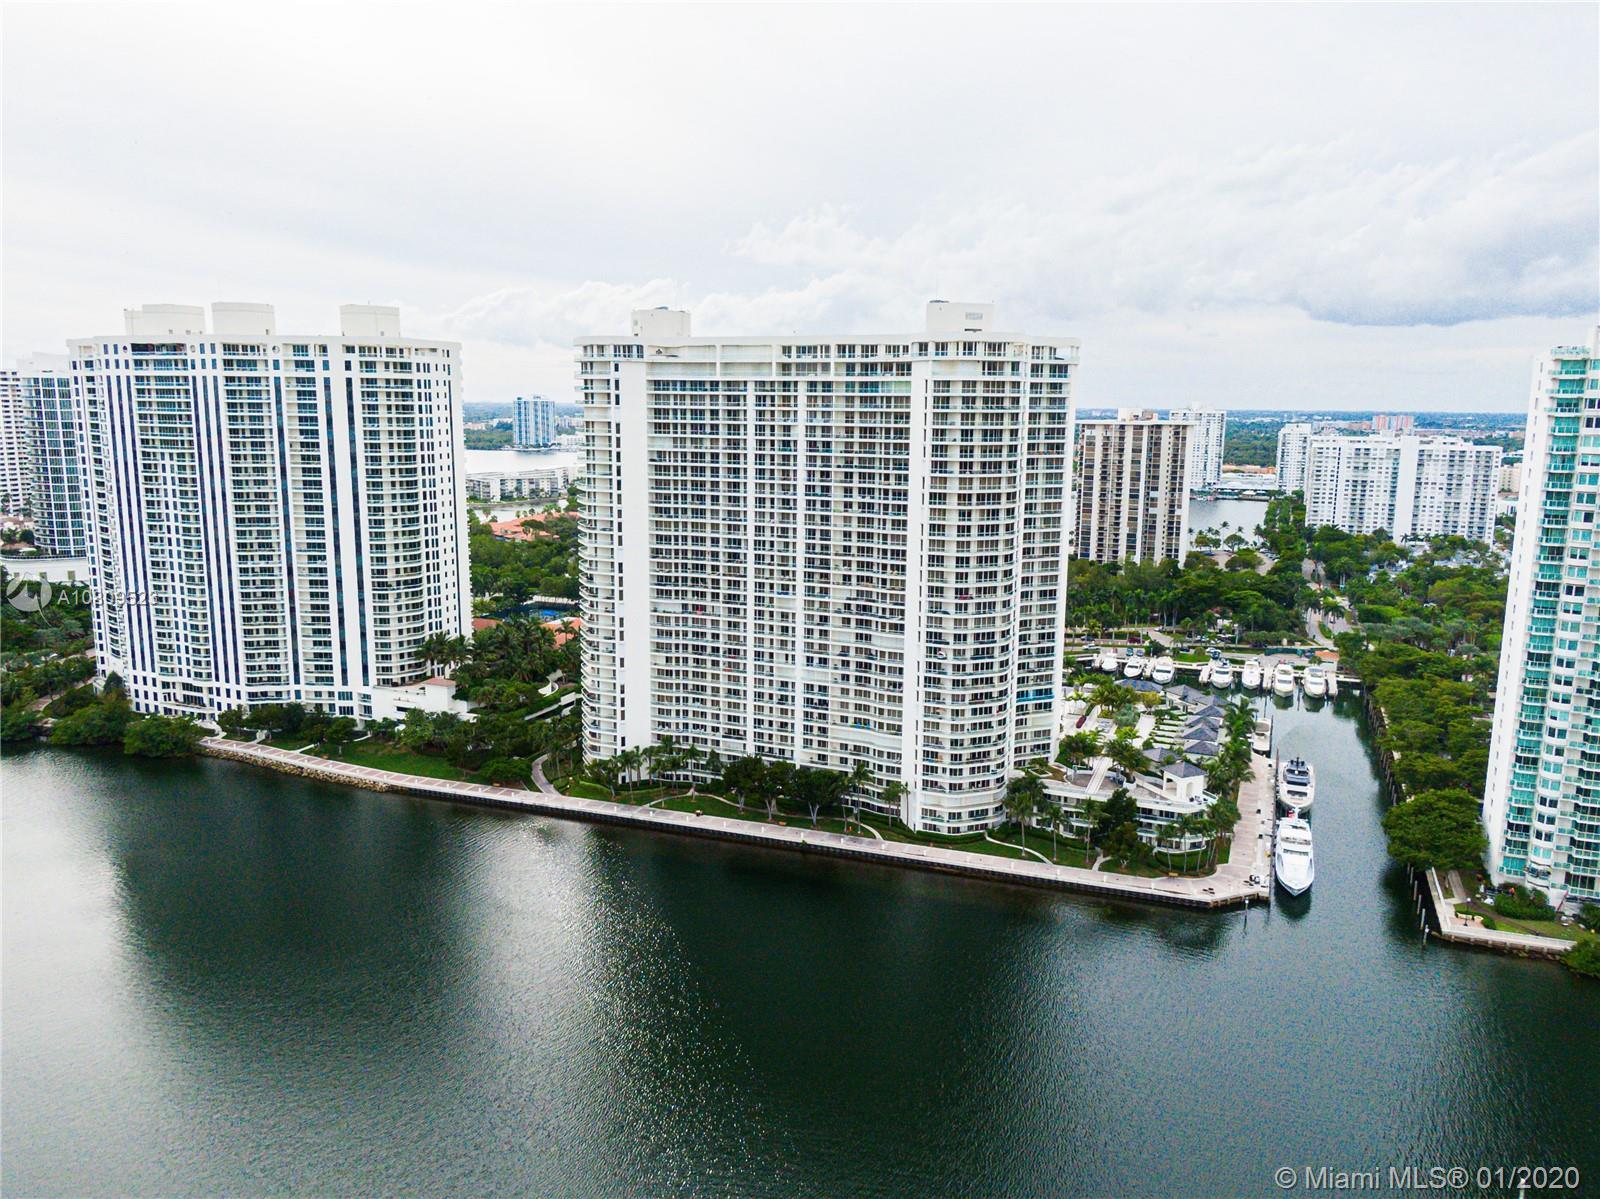 7000 Williams Island #2806 - 7000 Island Blvd #2806, Aventura, FL 33160